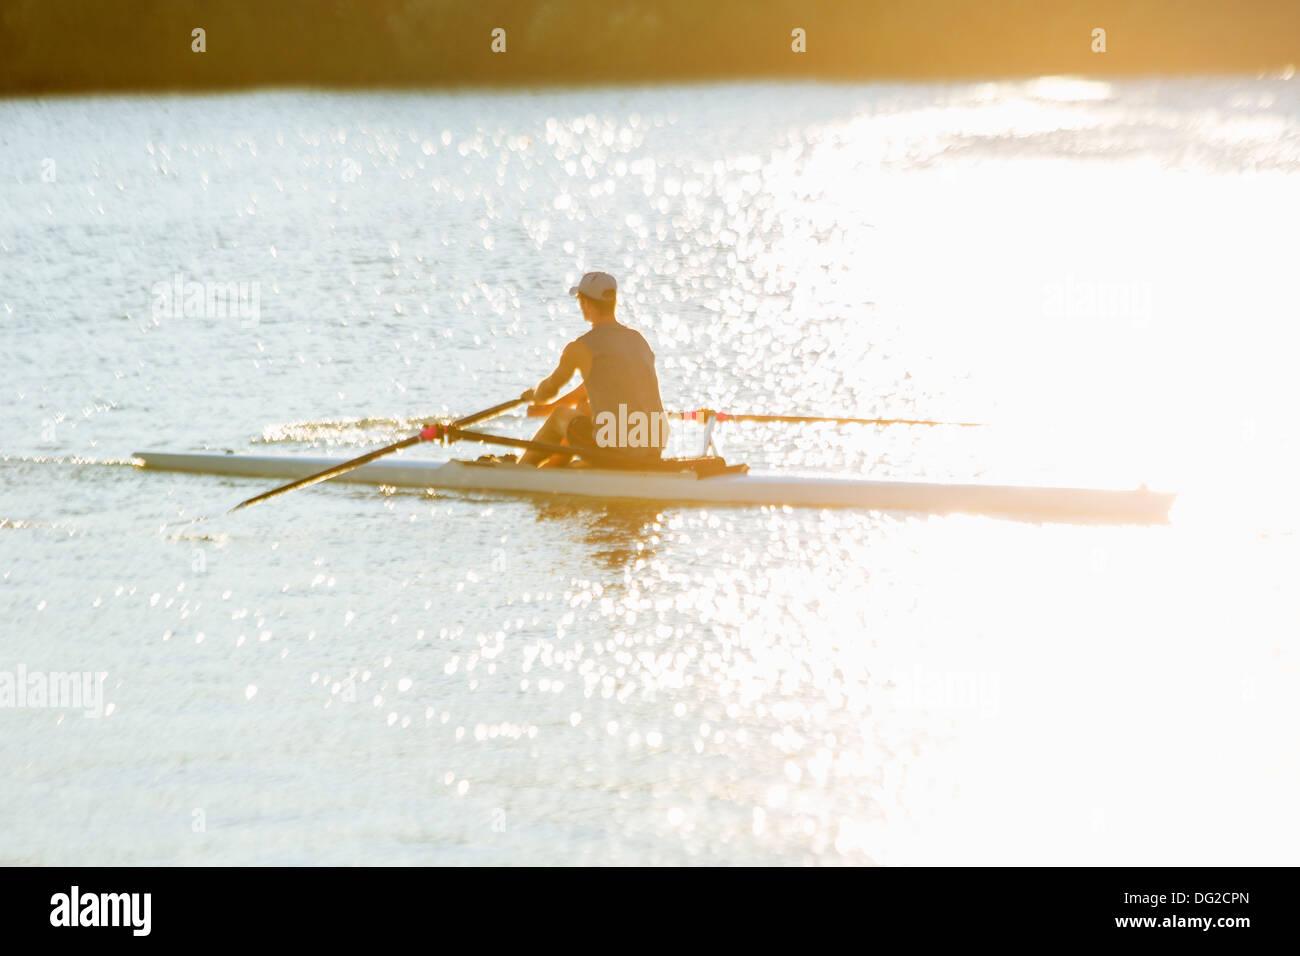 Canada,Ontario,Saint Catharines, Royal Henley Regatta Single, canottaggio Immagini Stock